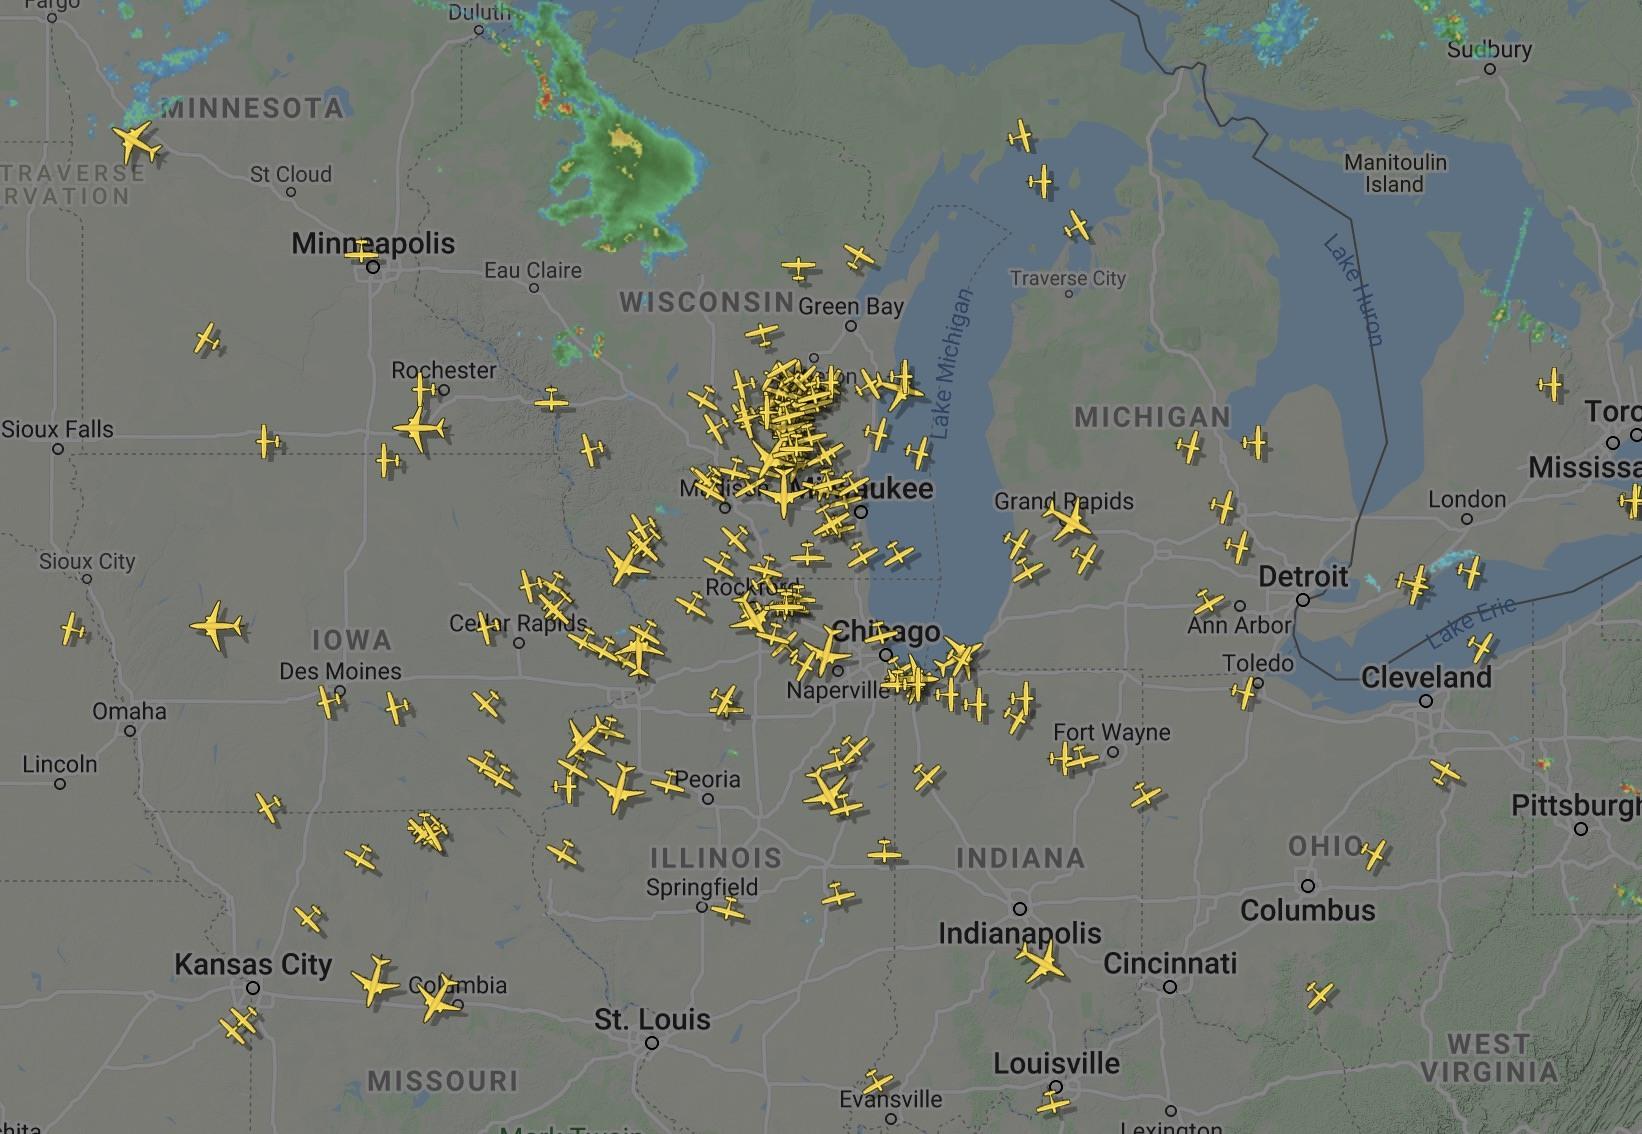 Aircraft departing Oshkosh